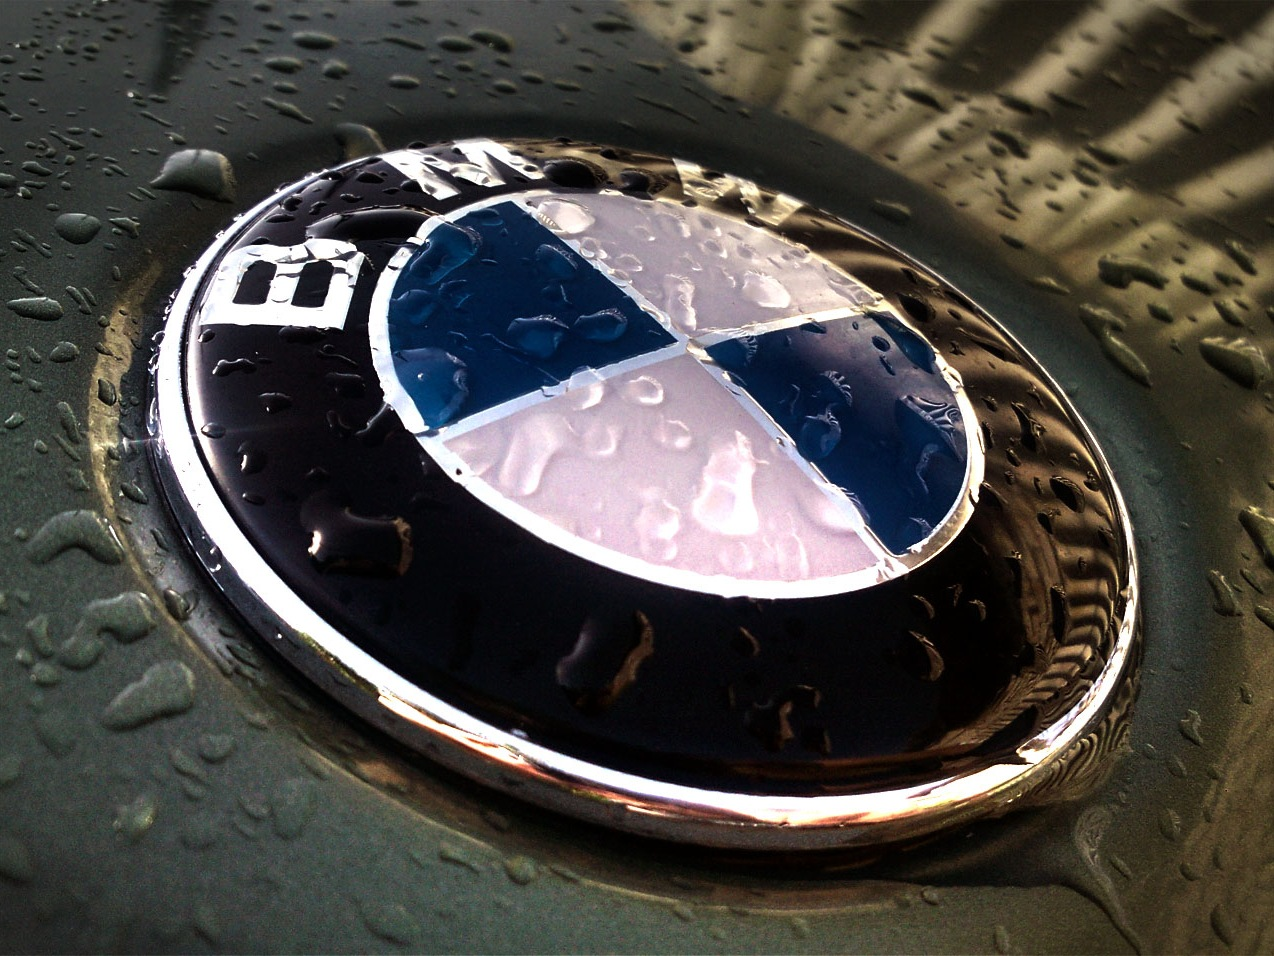 BMW Logo Wallpapers by Anibal on Saturday March 12th 2016 BMW Logo 1274x956